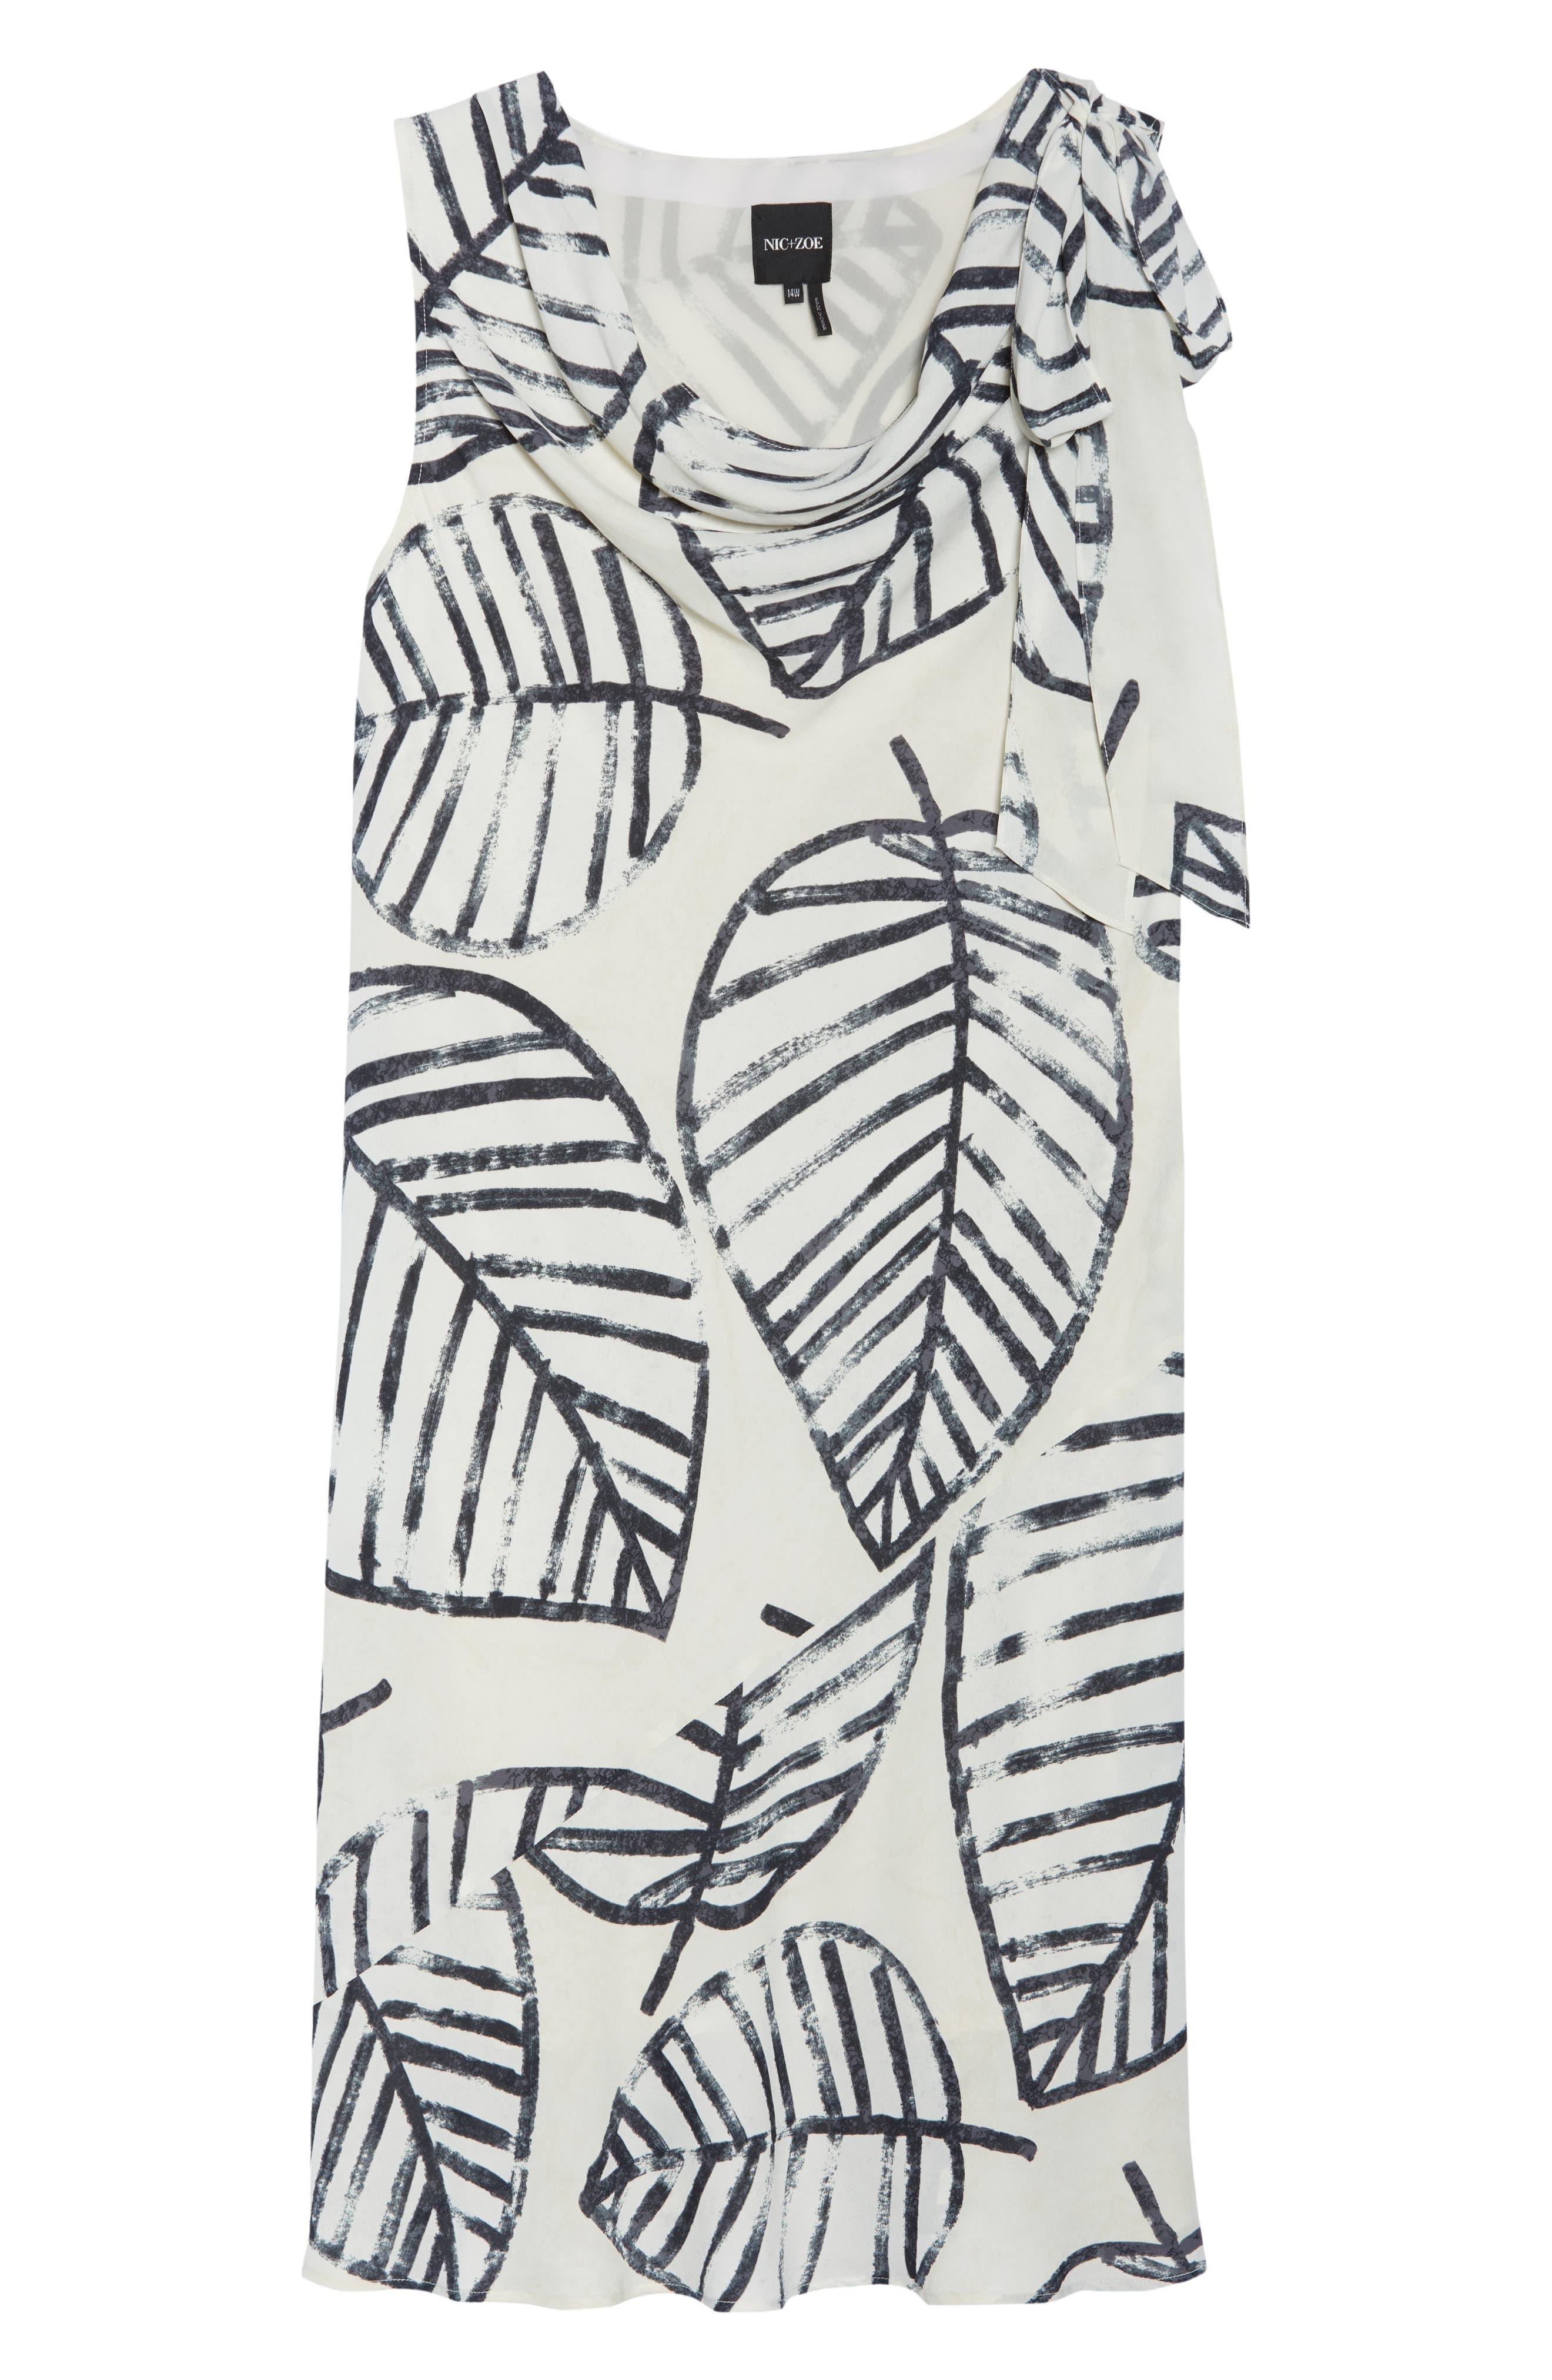 Etched Leaves Tie Dress,                             Alternate thumbnail 7, color,                             257